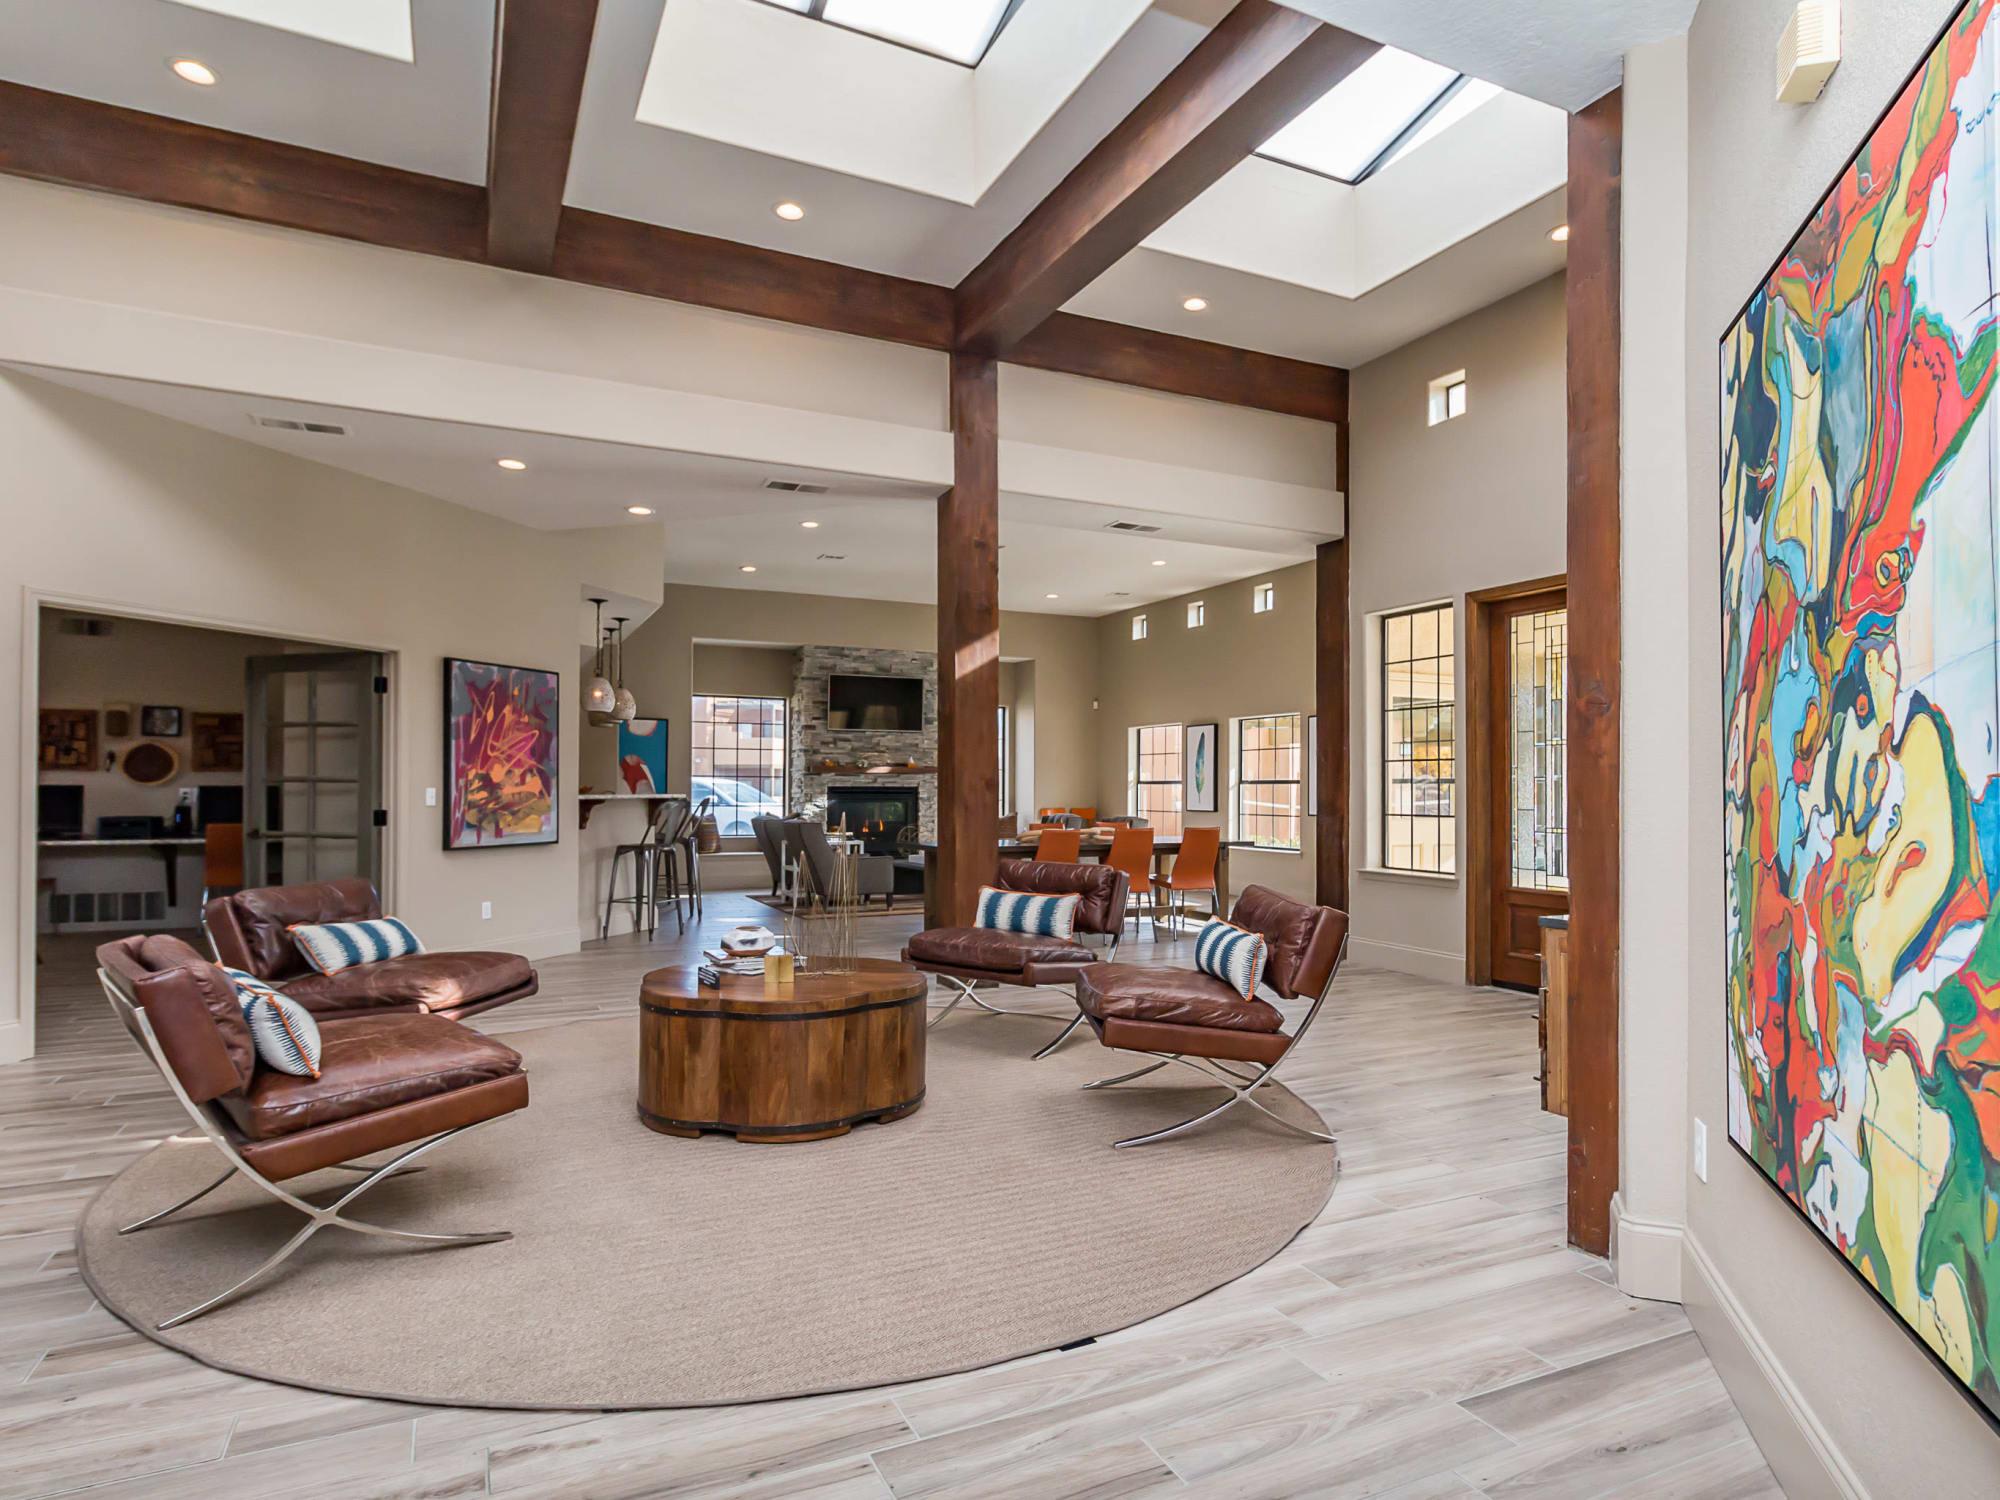 Enjoy our beautiful apartments in Albuquerque, New Mexico at San Miguel del Bosque